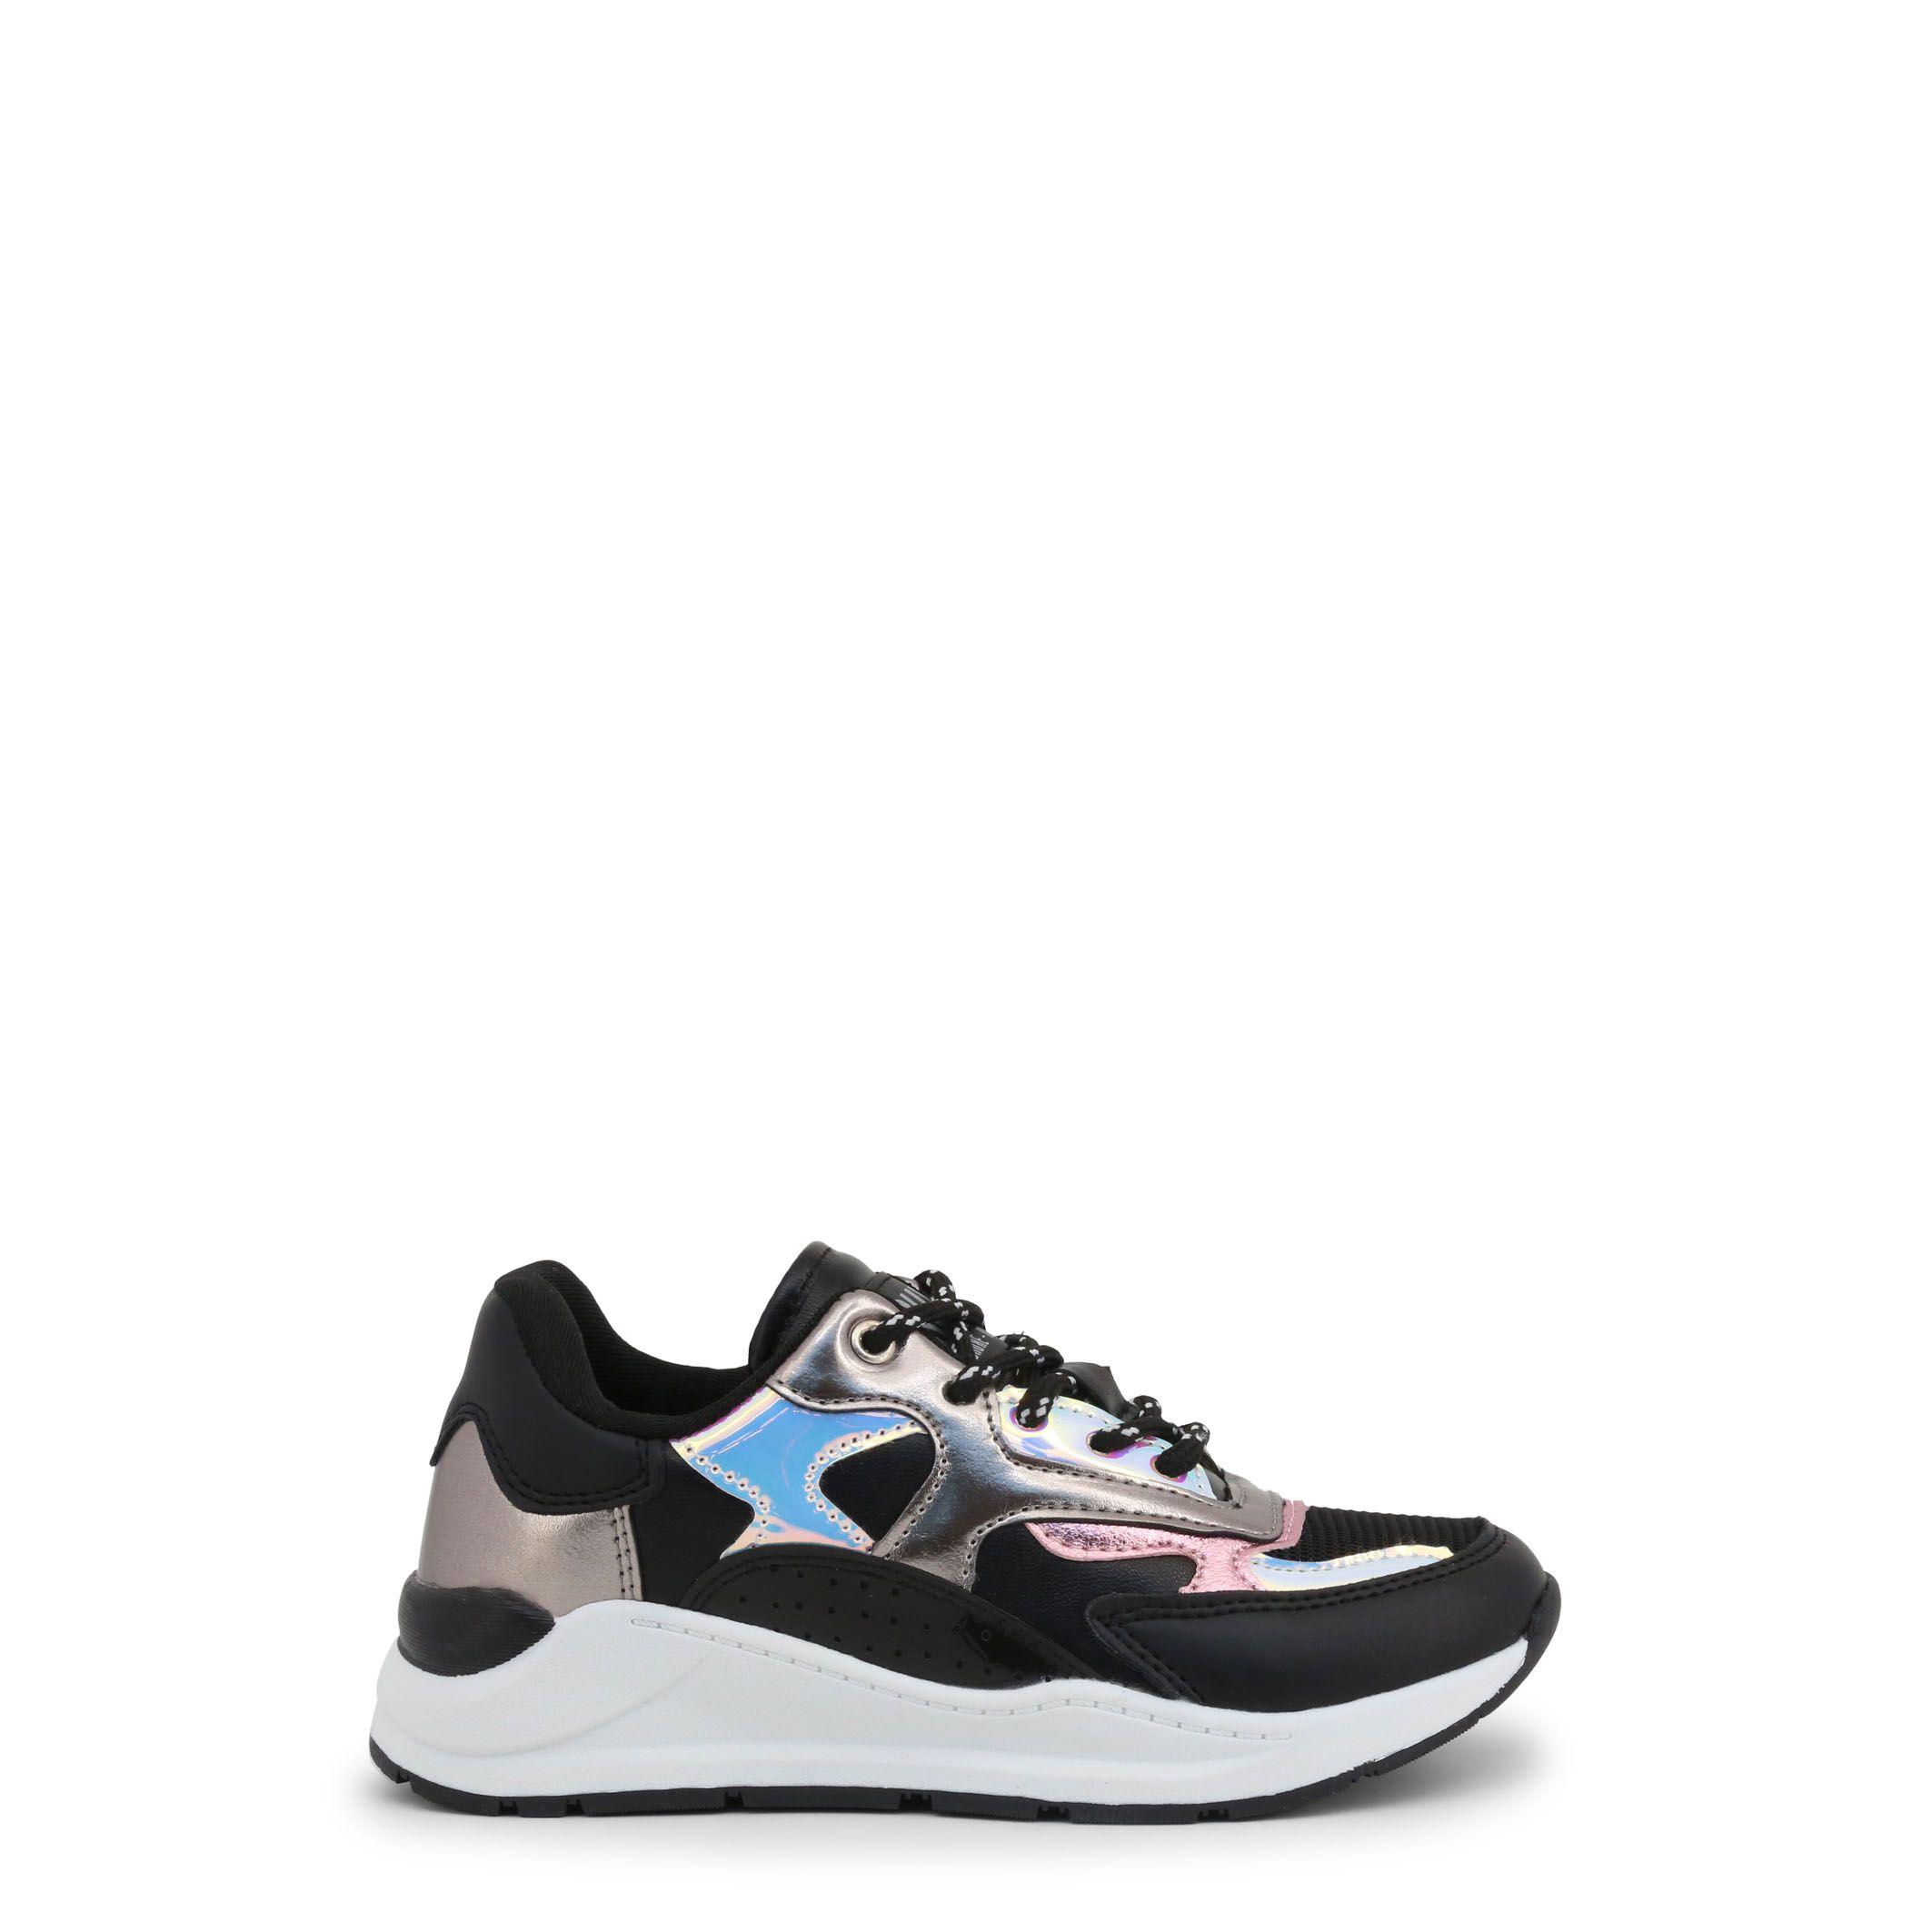 Chaussures Shone – 3526-002